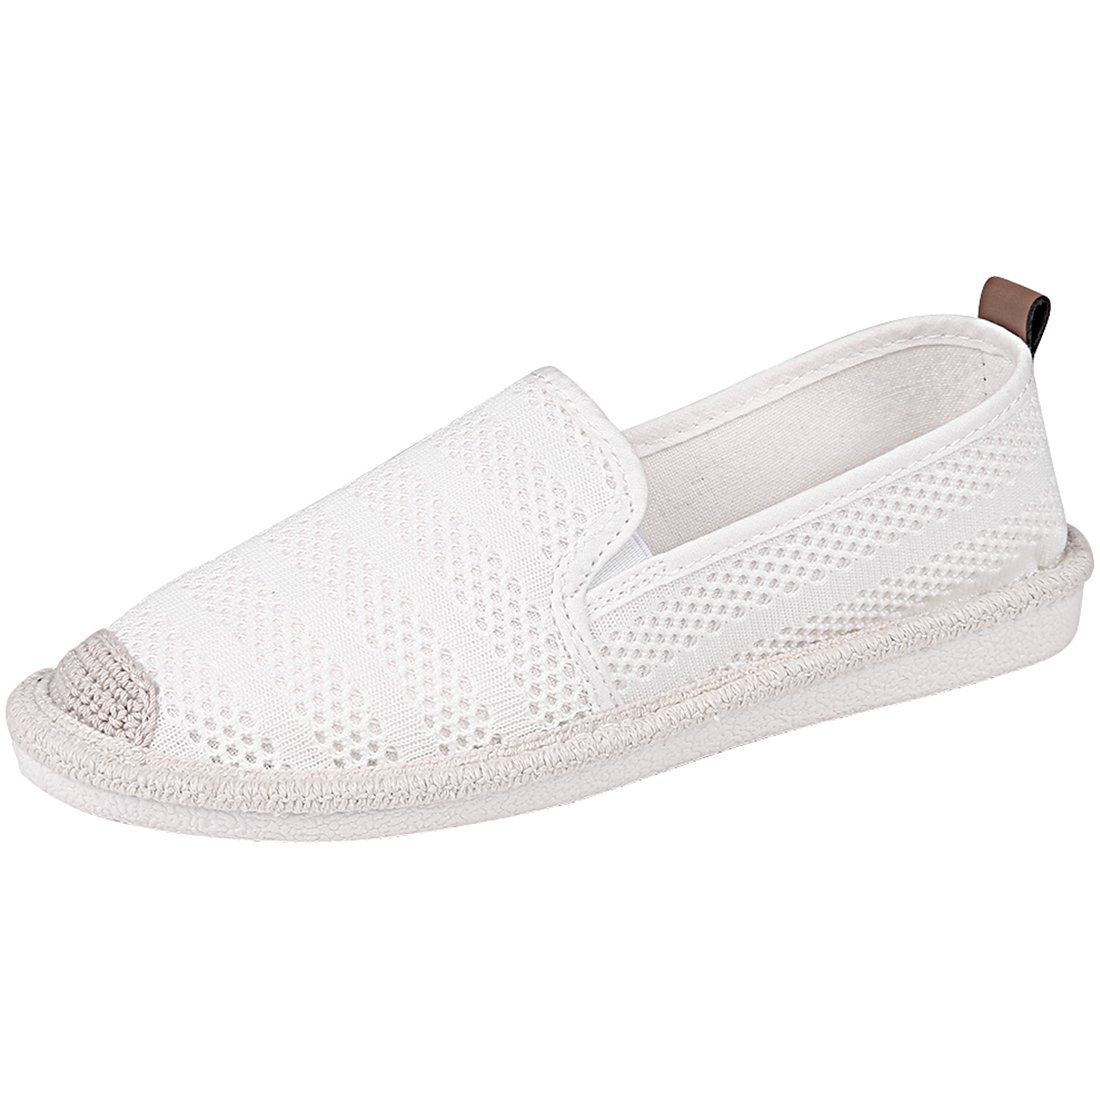 Women's White Mesh Slip On Loafer Casual Flats Walking Espadrille Sneakers